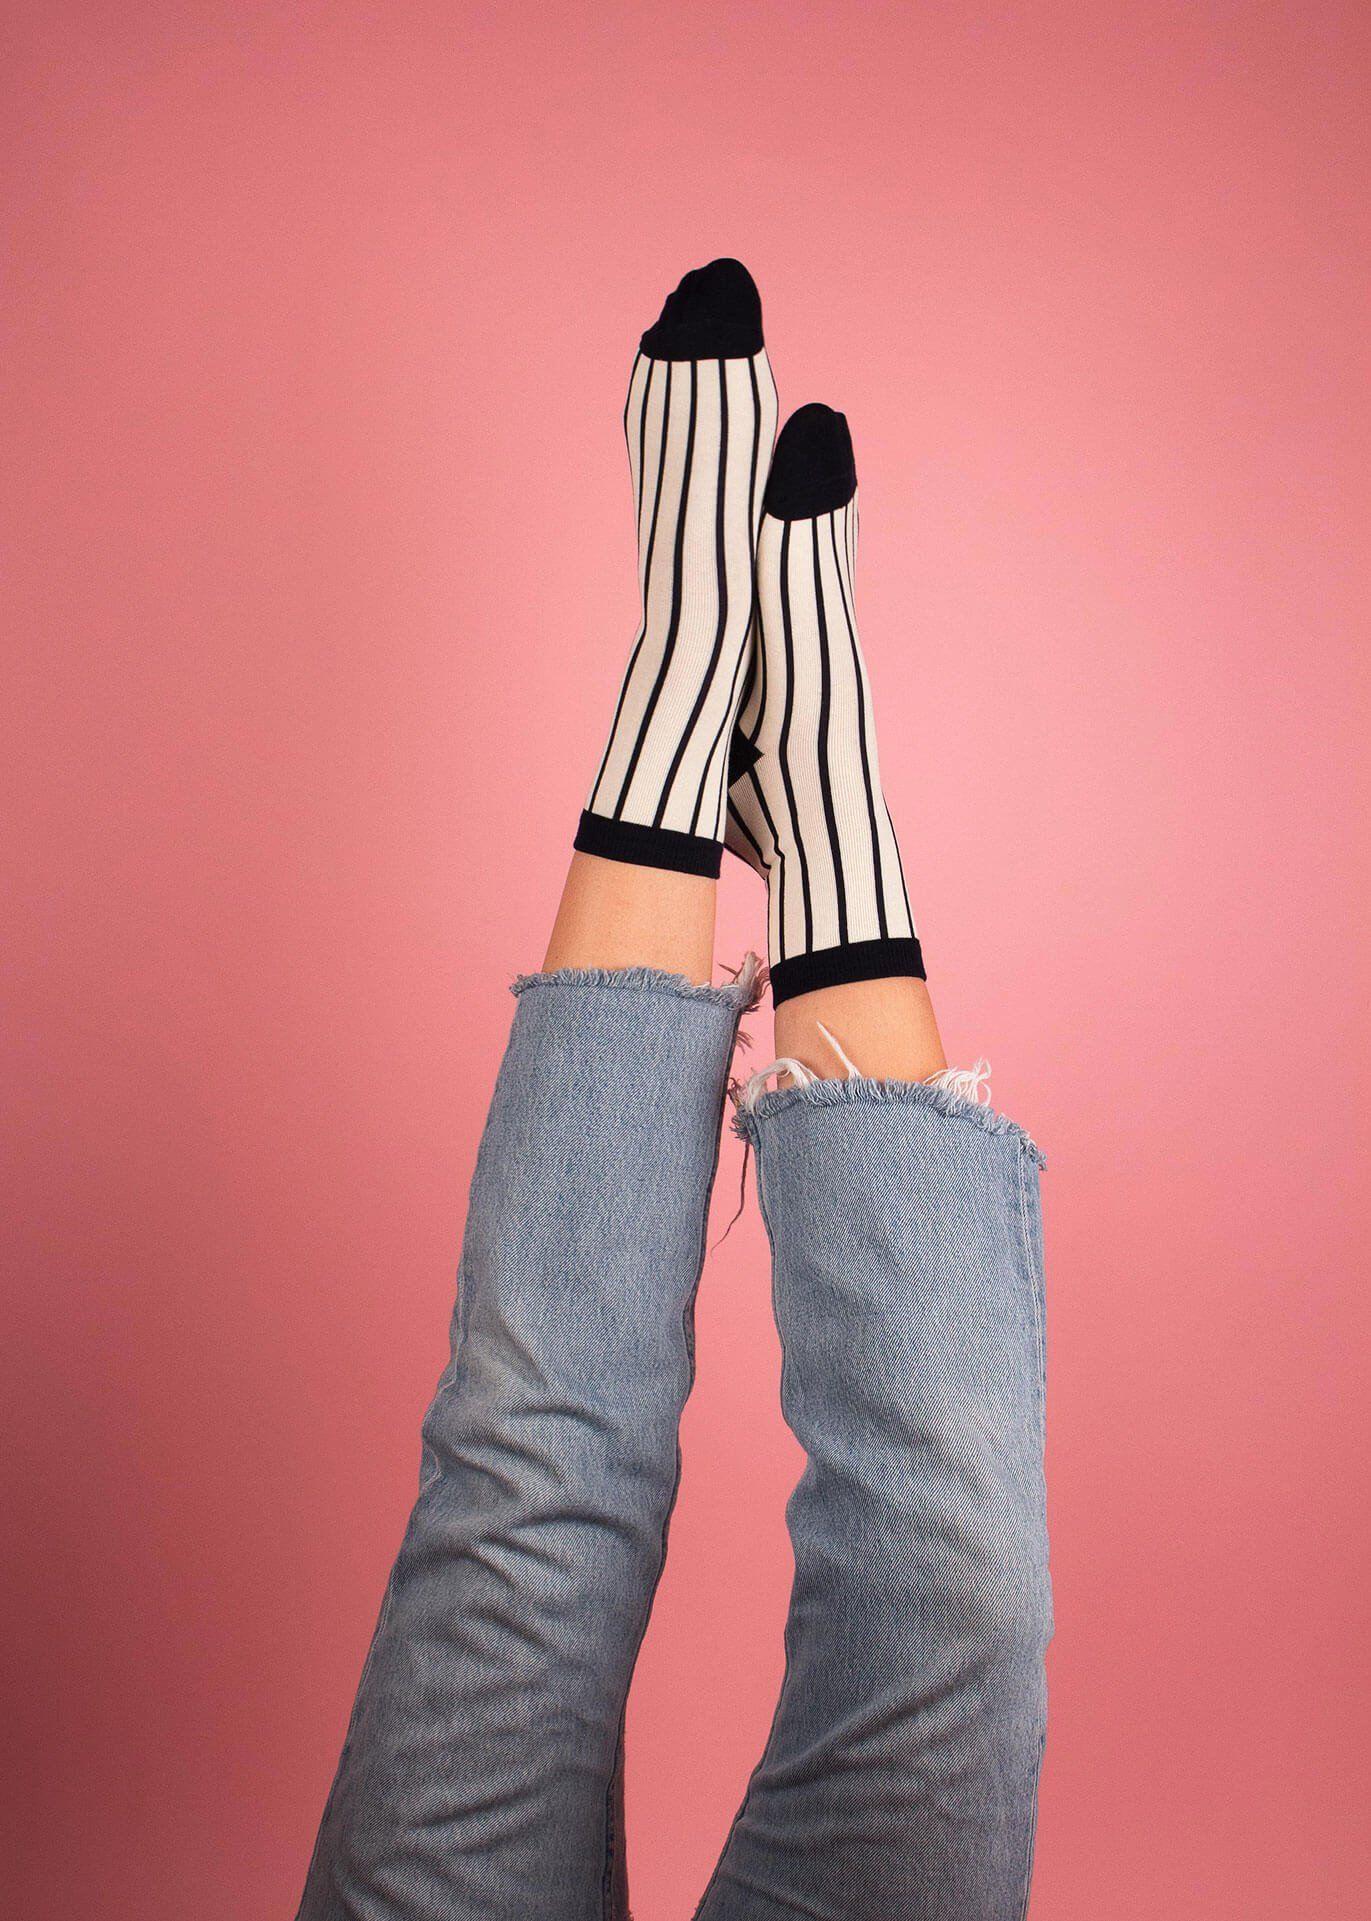 Jail Bird  $11CAD #socks #socklove #shopokiedokie